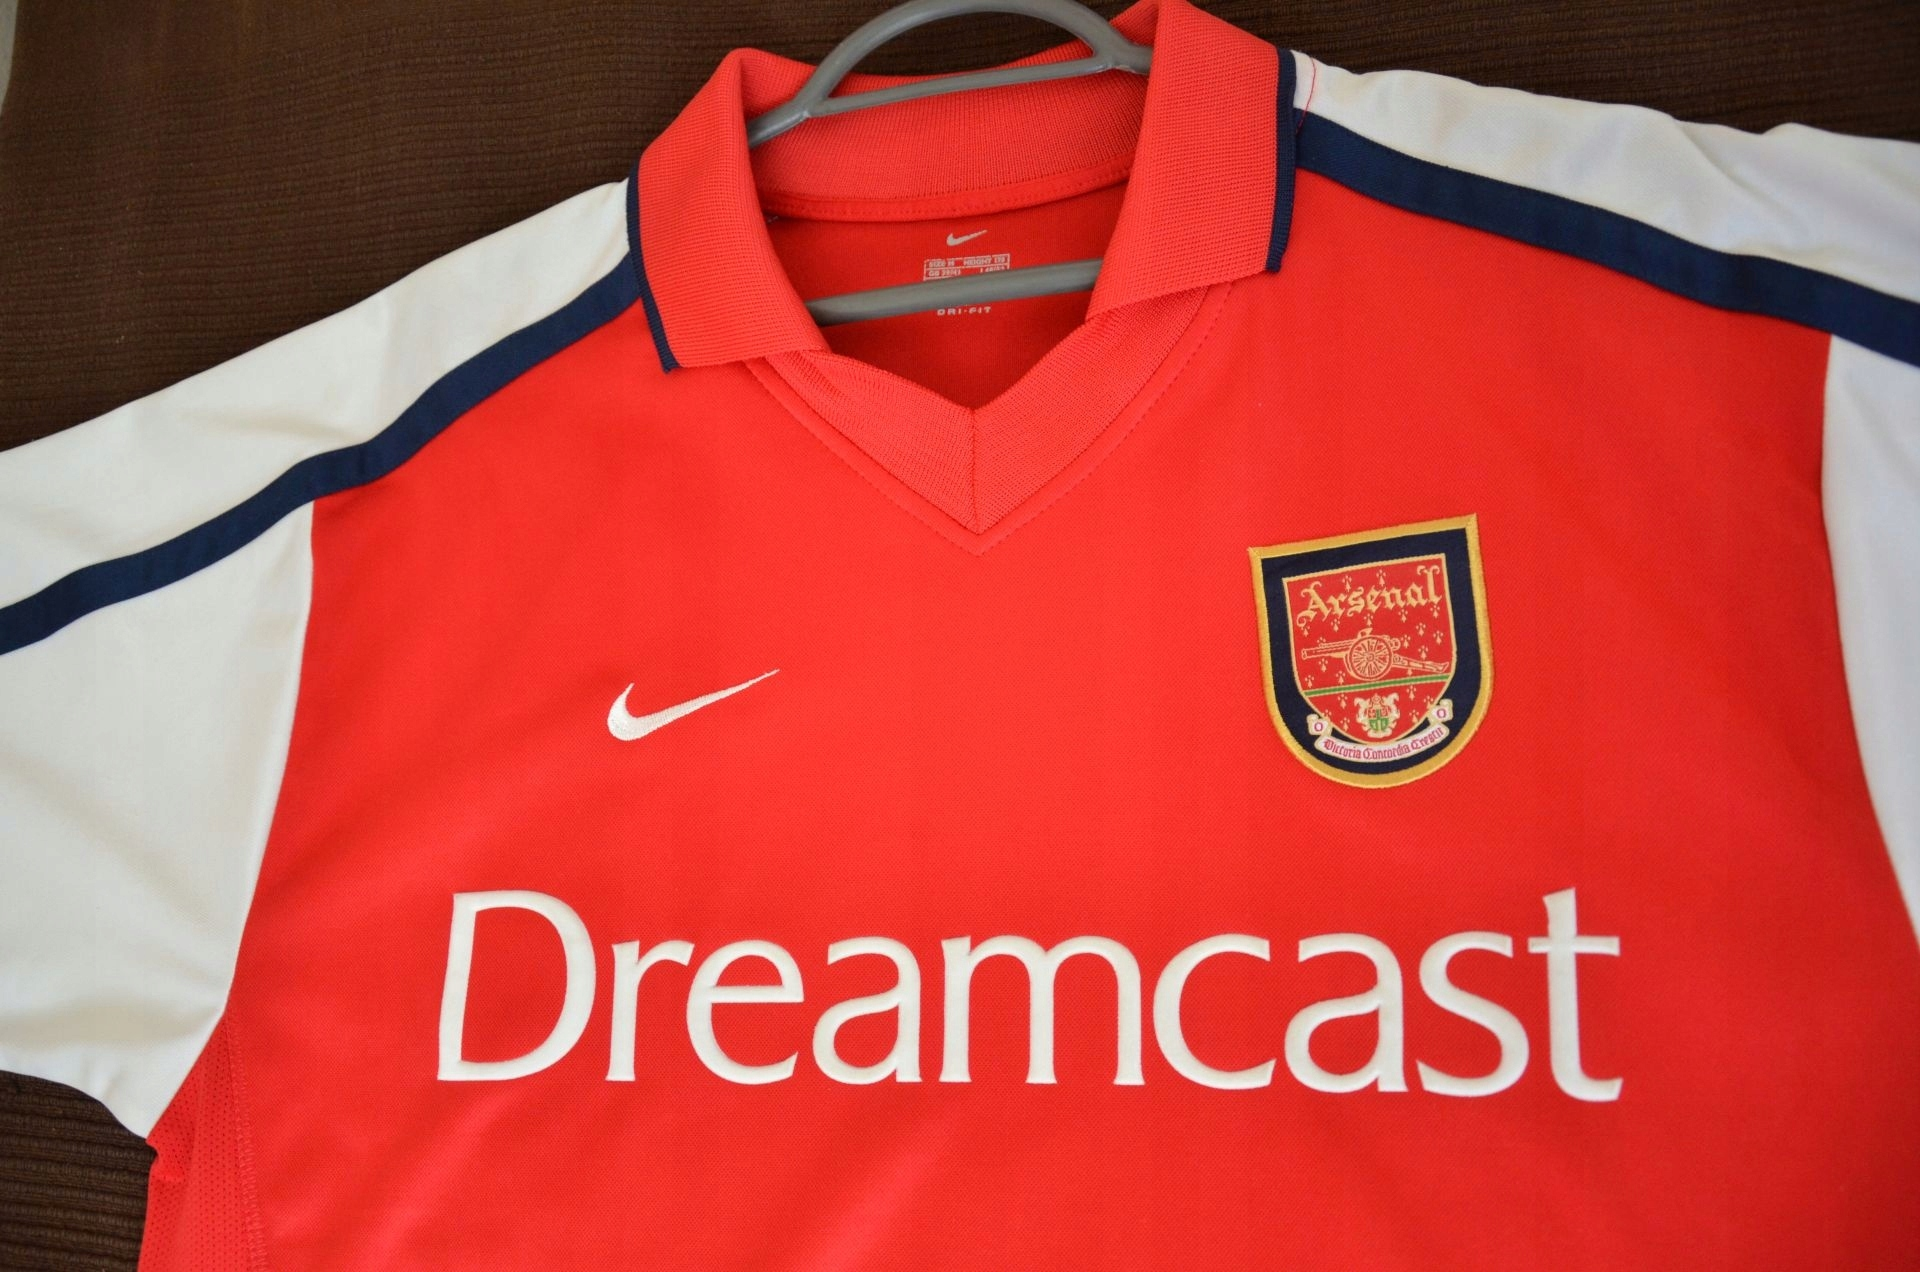 c1af0e938 Koszulka Arsenal London Dreamcast Nike M Unikat - 7606382724 ...